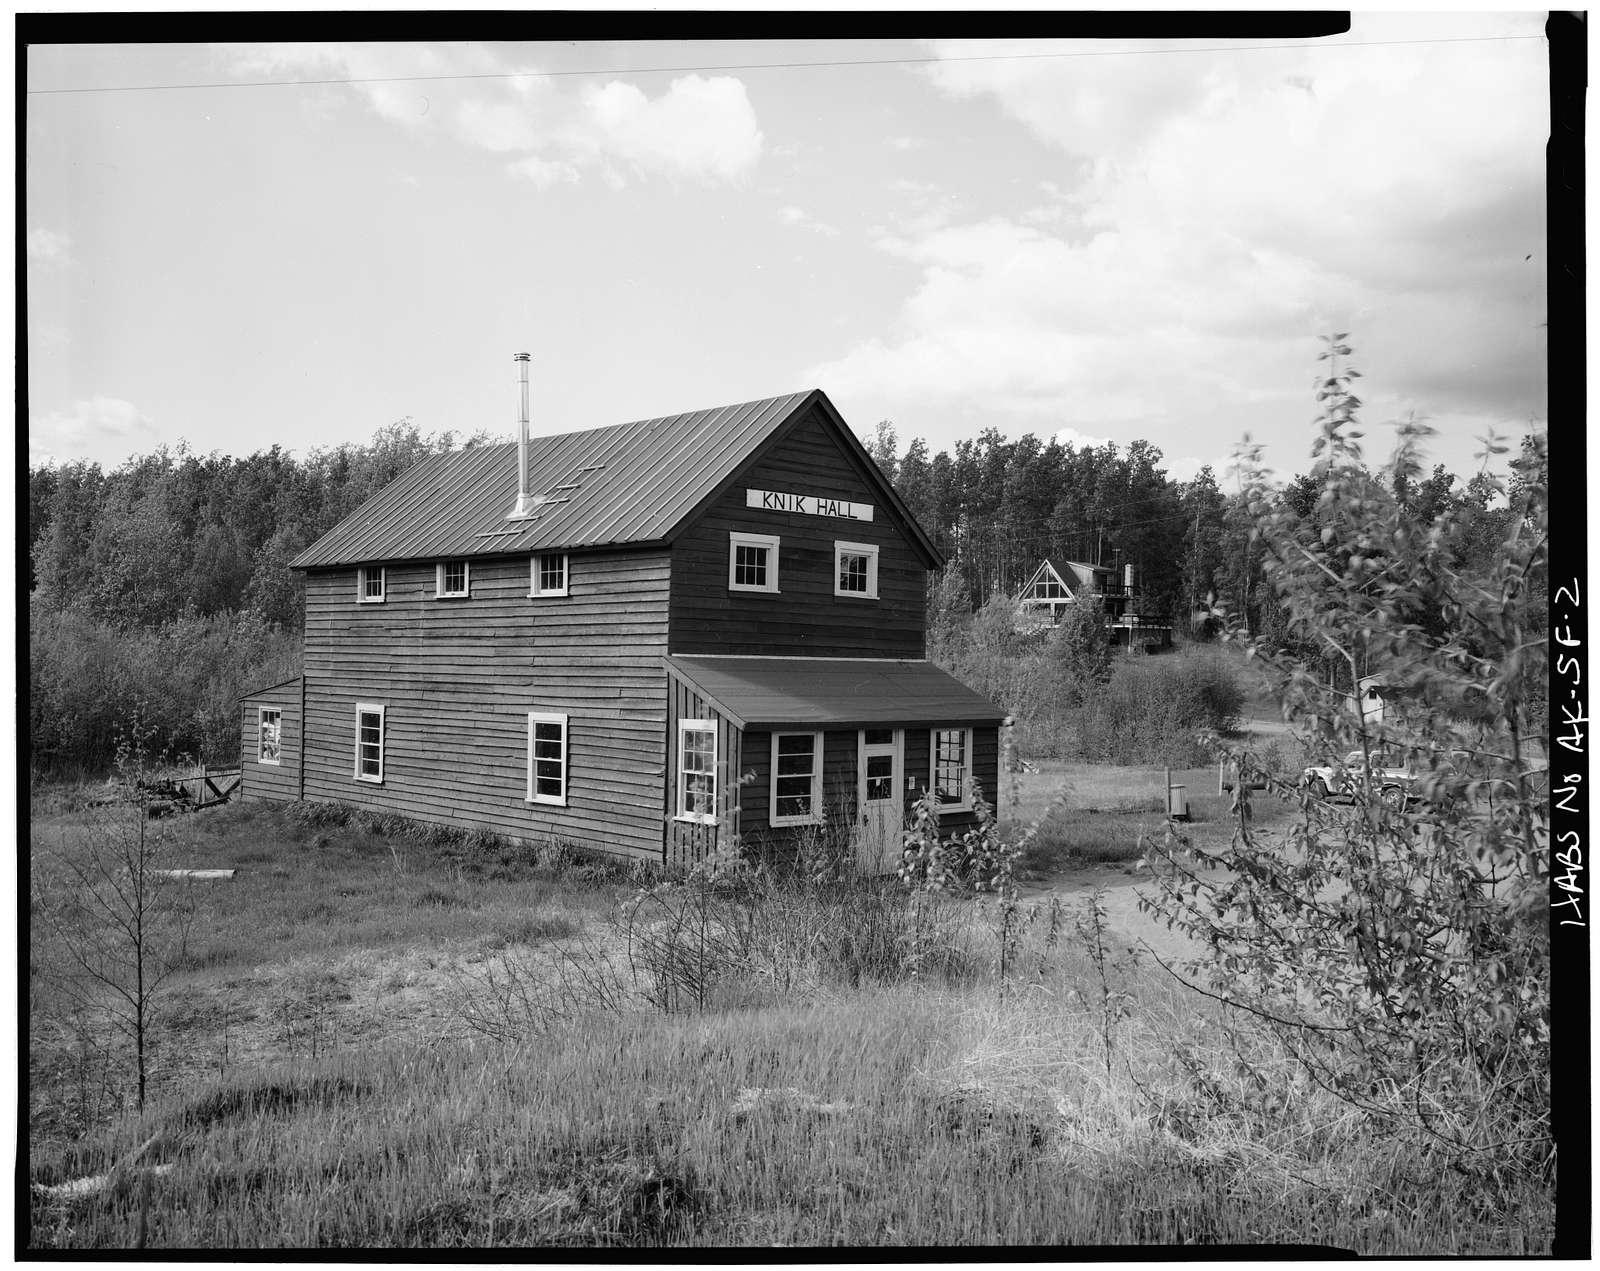 Iditarod Trail Shelter Cabins, Knik Hall, Knik, Matanuska-Susitna Borough, AK